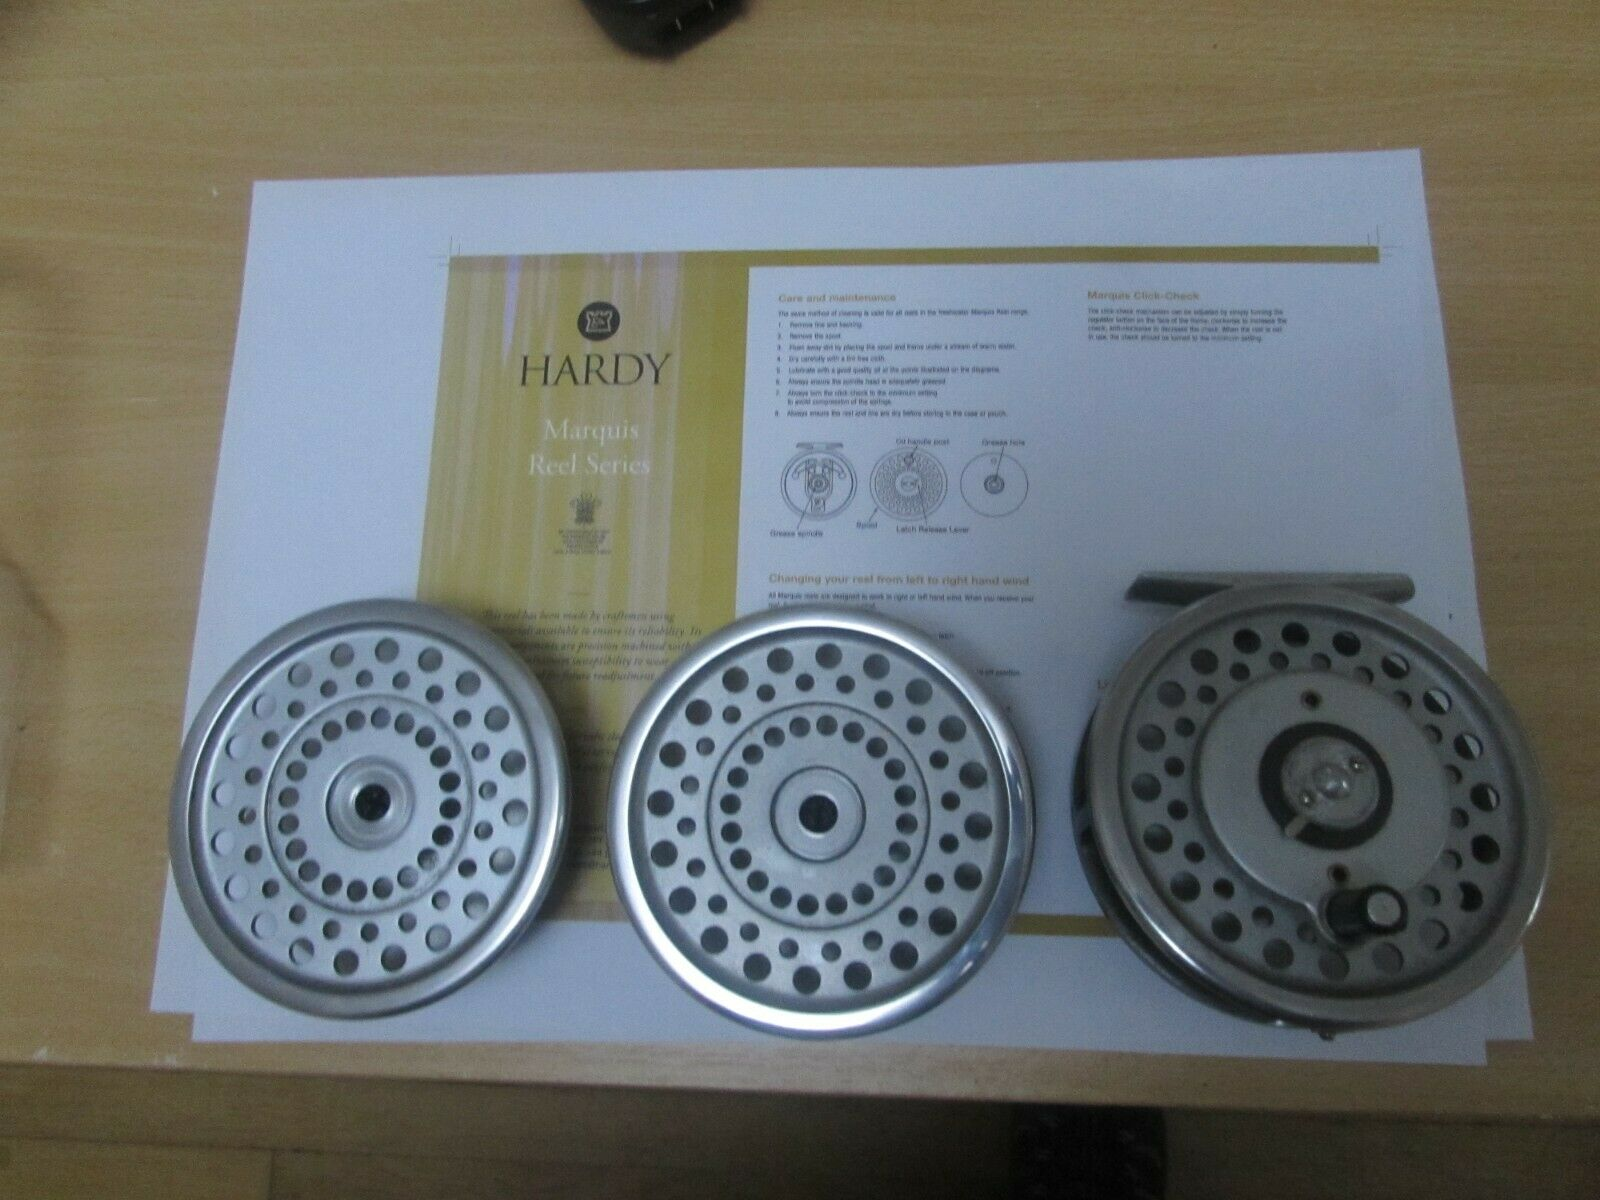 A1 eccellente VINTAGE Hardy Marquis 7 Moltiplicatore Trossoa Fly pesca Reel 2 BOBINE